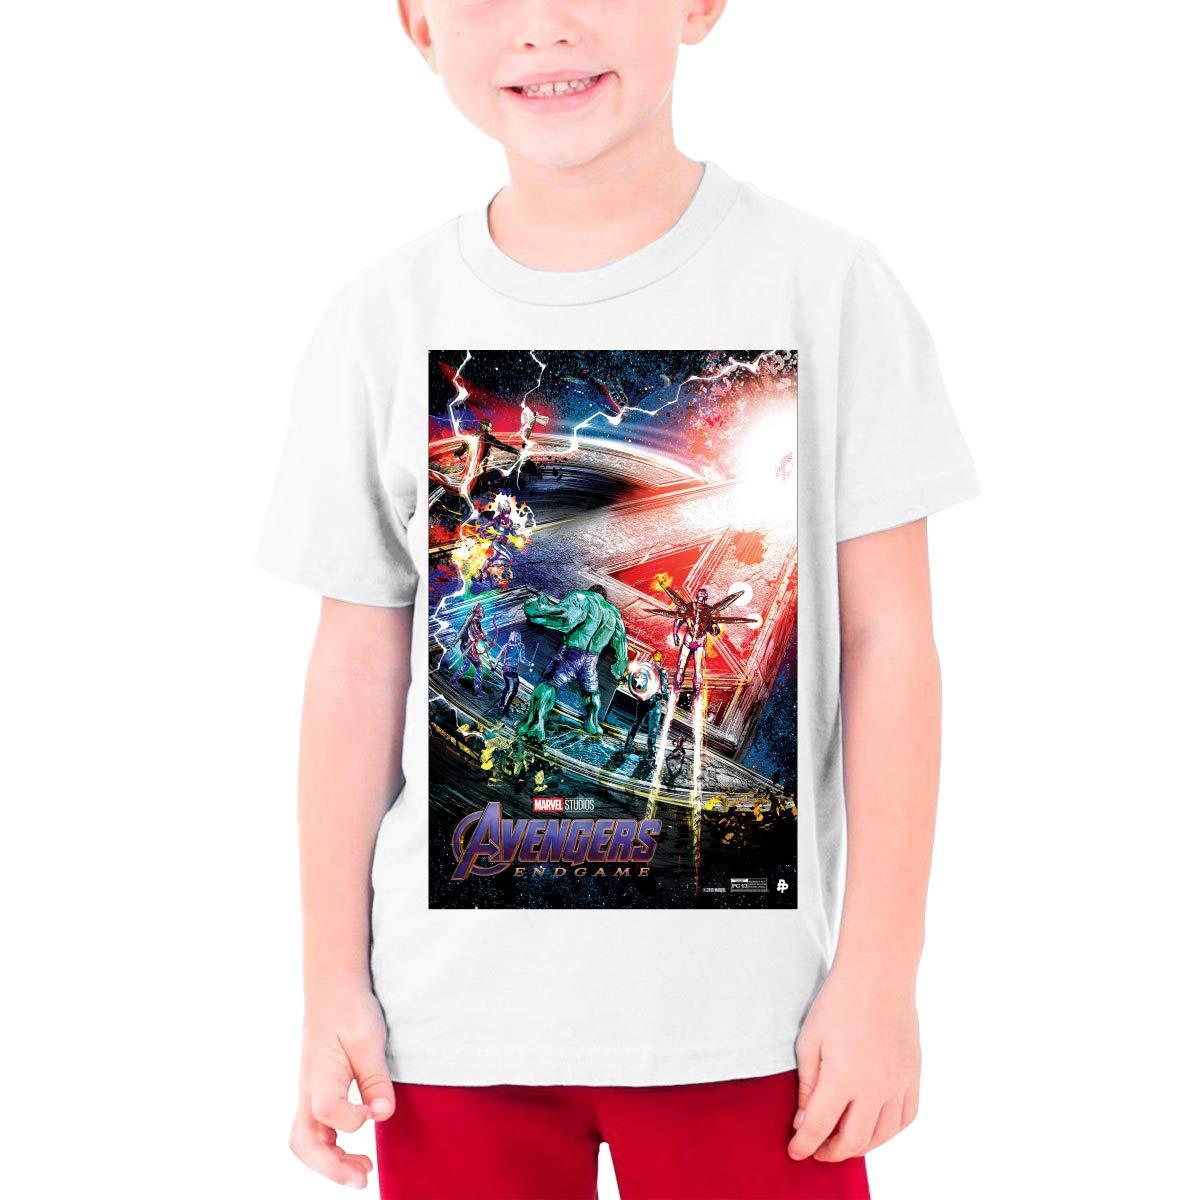 Lianliya Unisex Girls Ave Ngers End Game Short Sleeve Tee T Shirts 8000